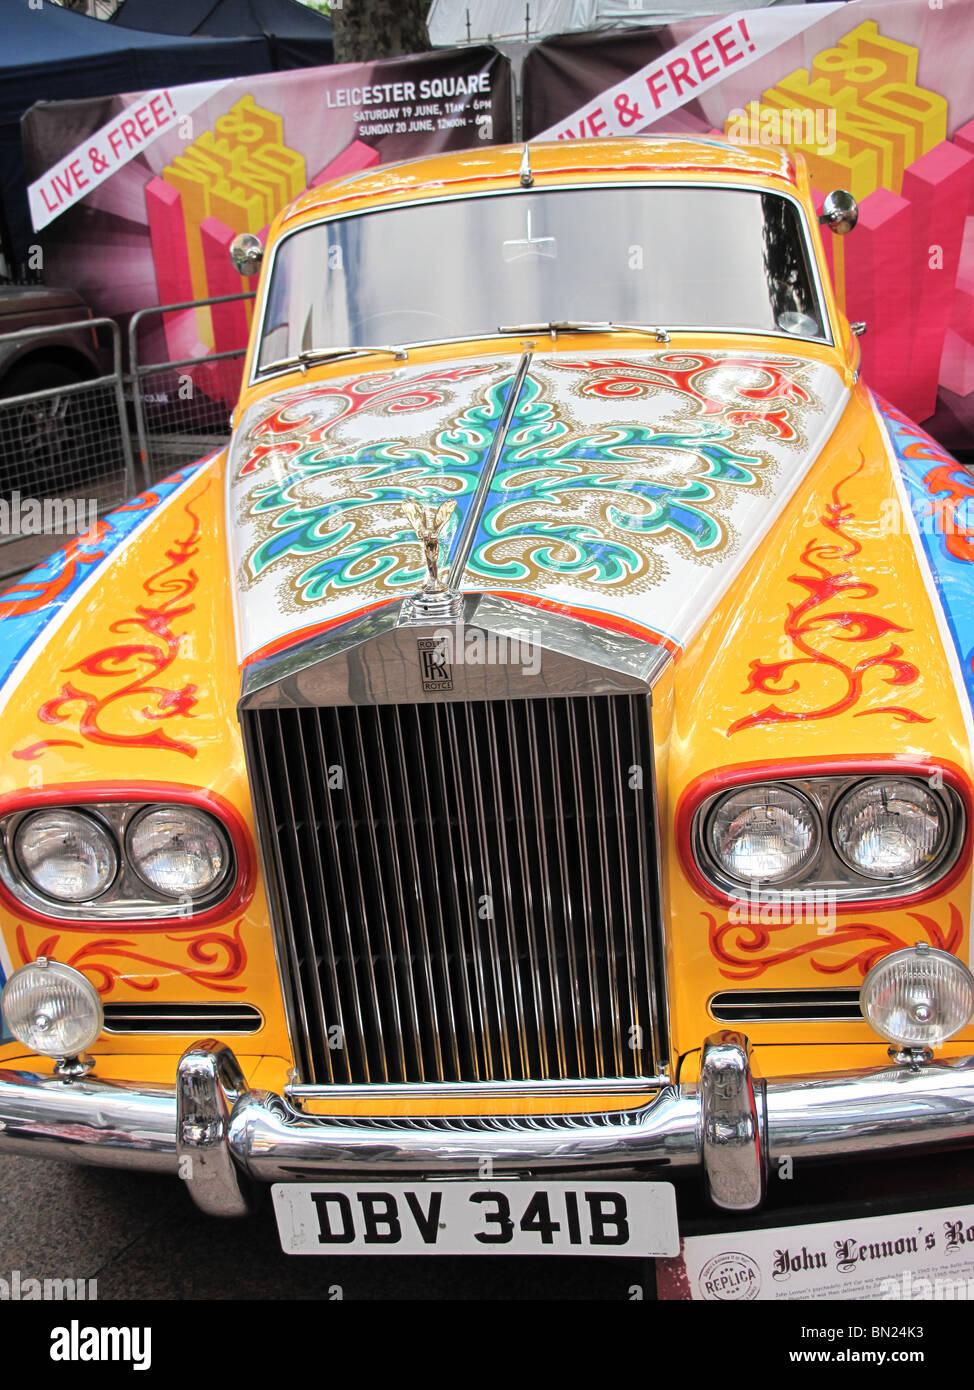 John Lennon Beatles Rolls Royce 1967 Hippy Psychedelic - Stock Image